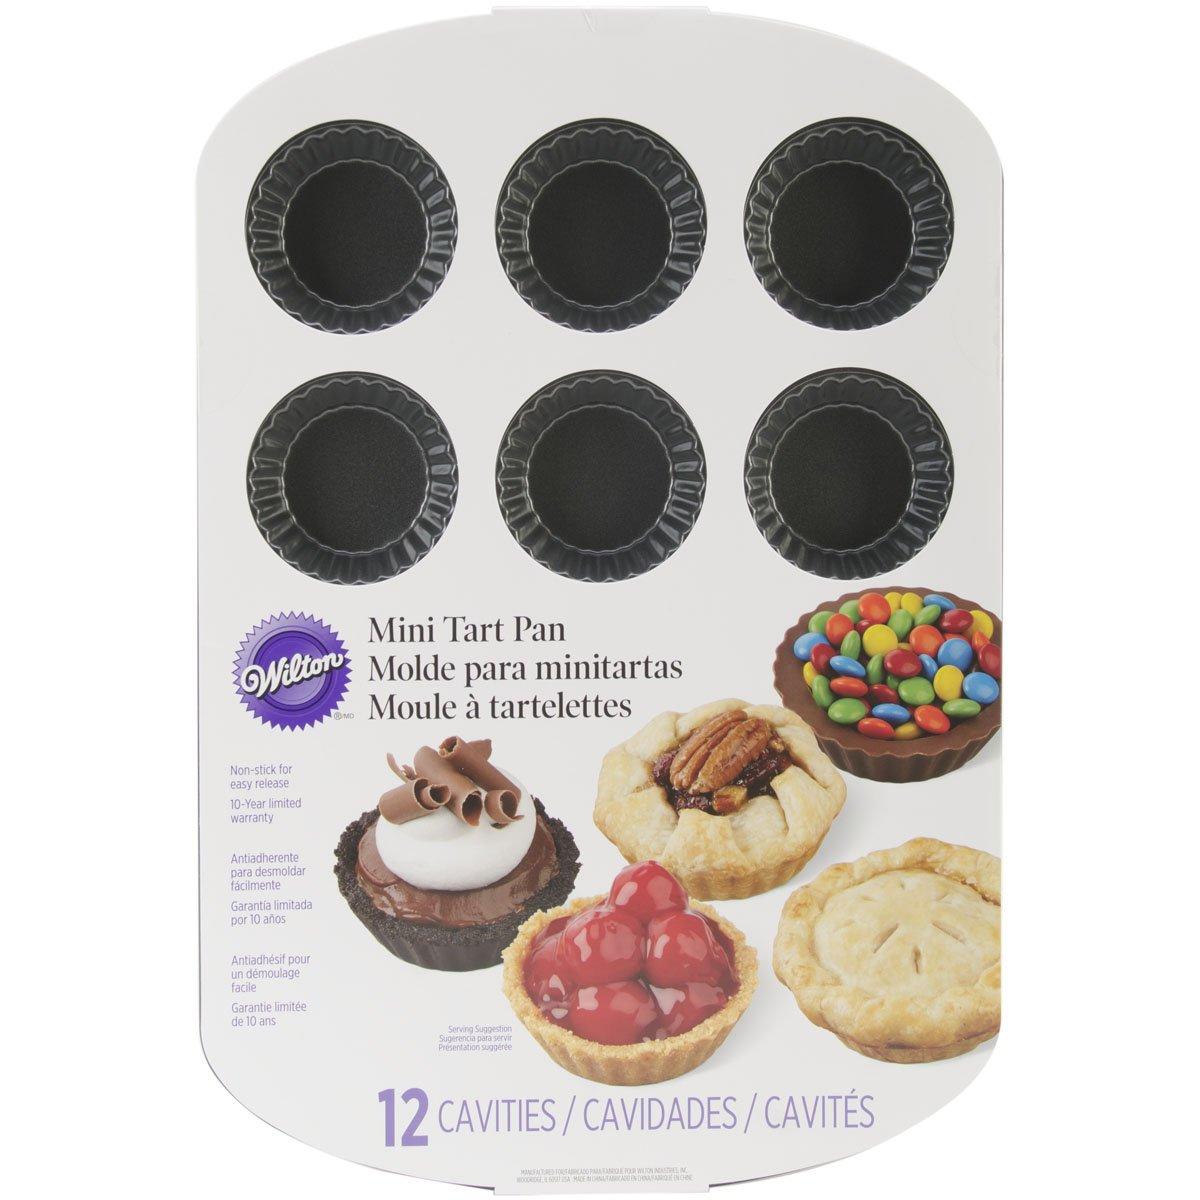 Wilton Non-Stick Mini Tart Pan, 12-Cavity 2105-0089